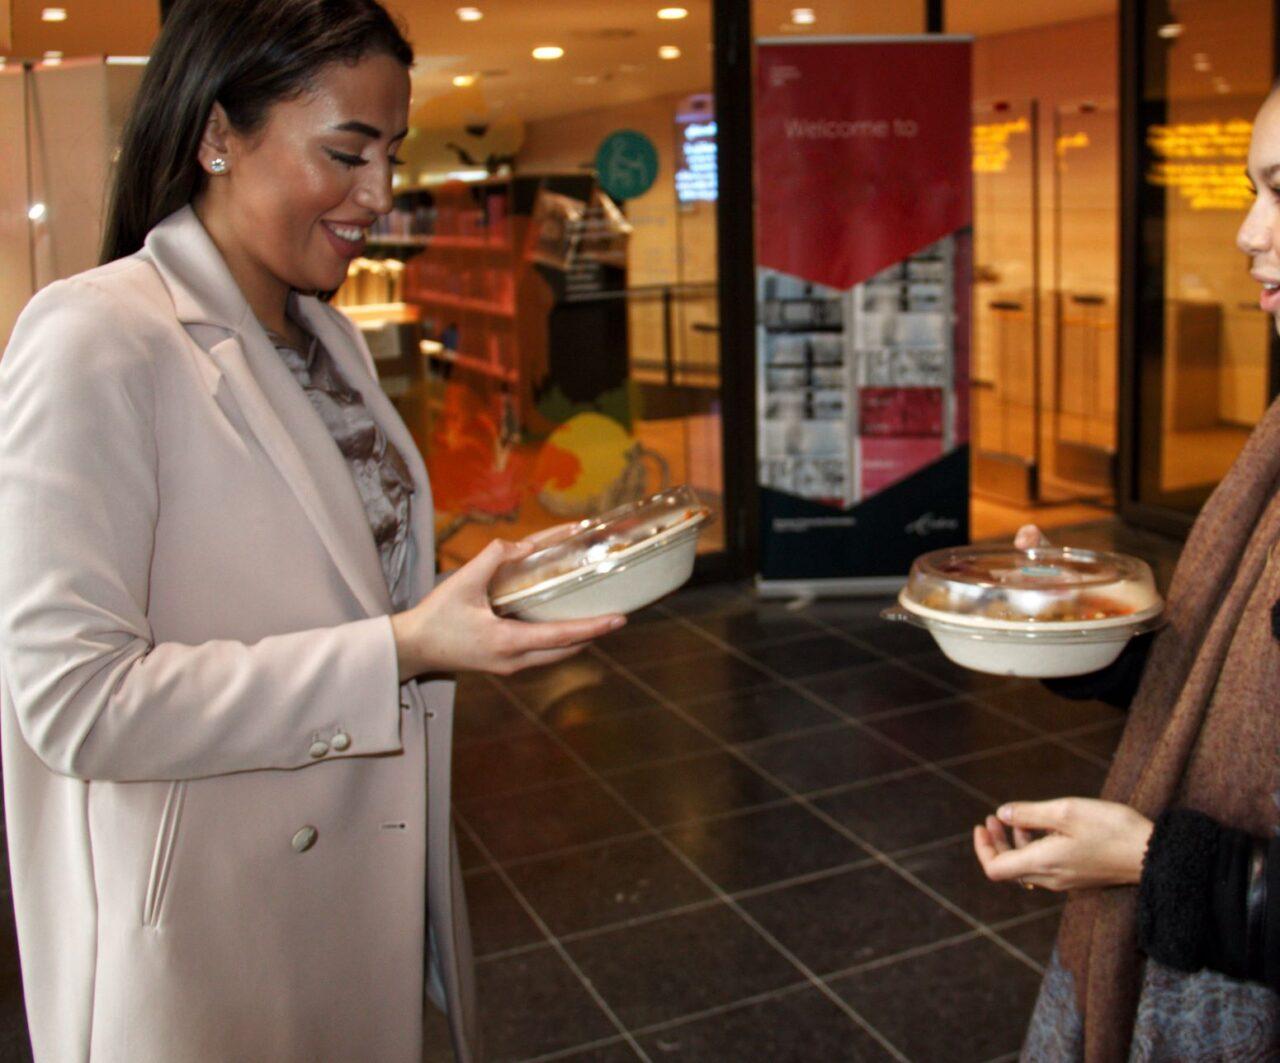 Freshtable – Yasmina handing out food – Milena Chopova